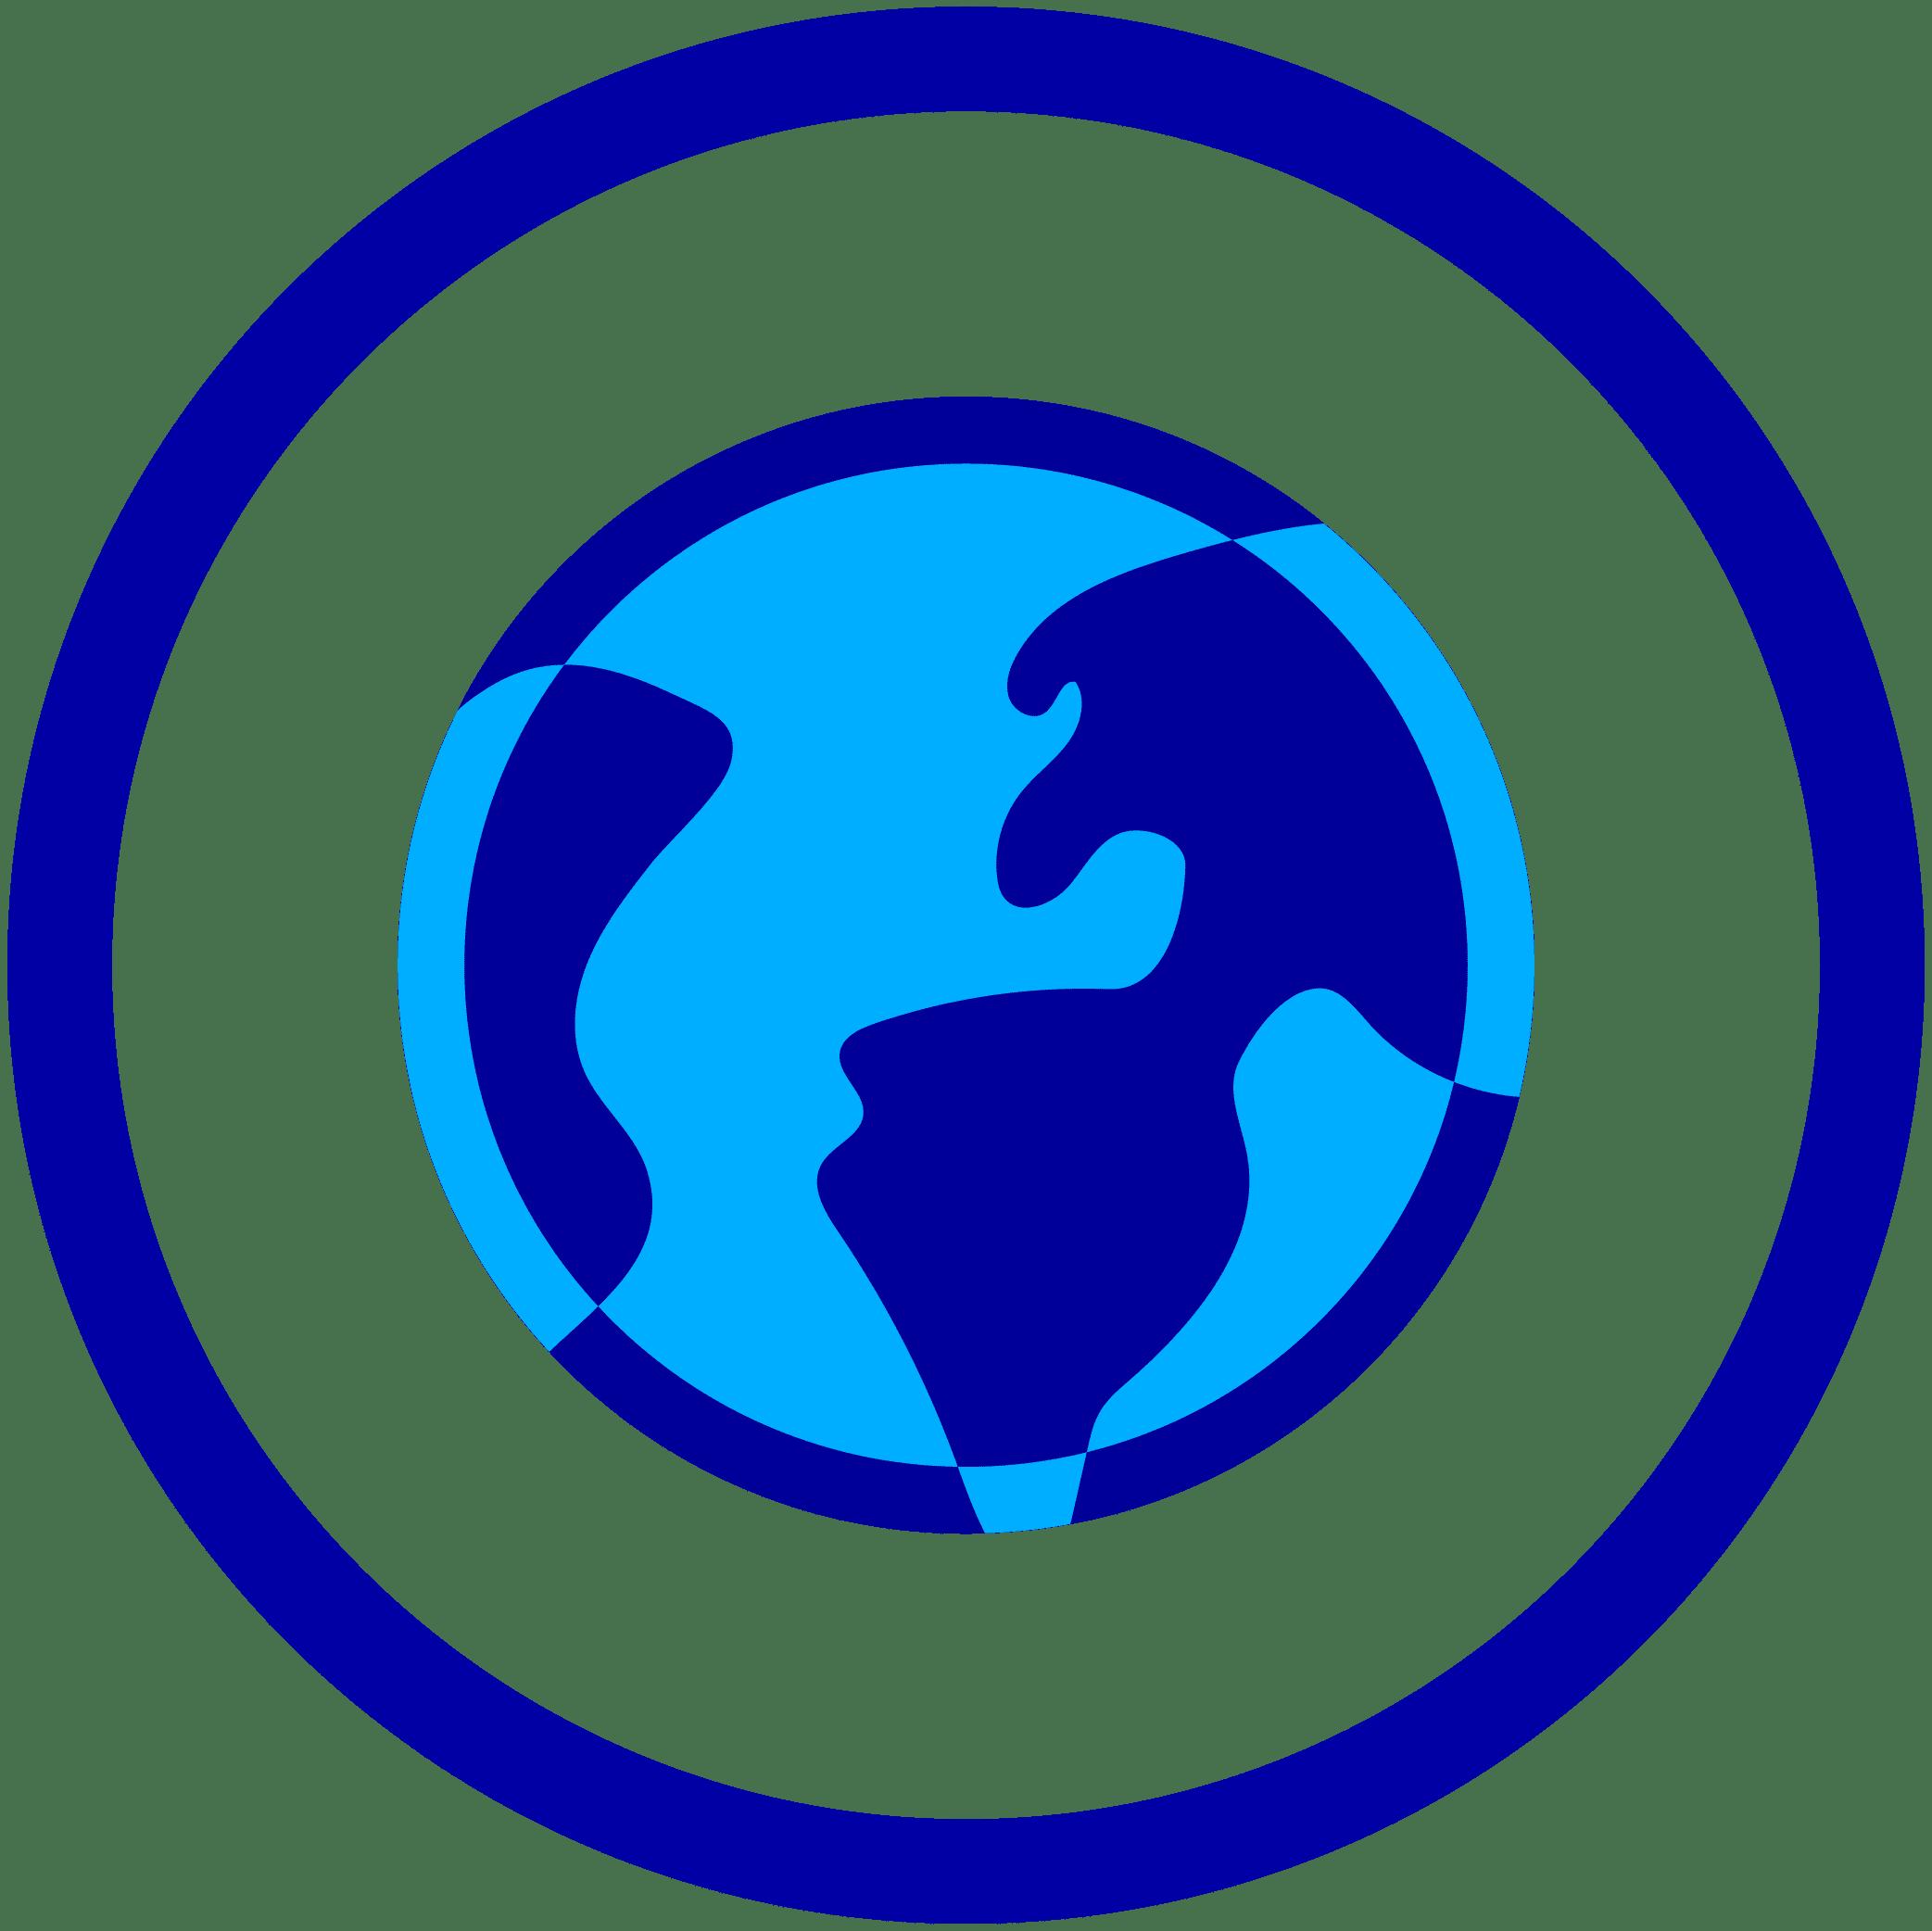 https://uk.fi-group.com/wp-content/uploads/sites/7/2021/02/blue-icons-set_1-13.png